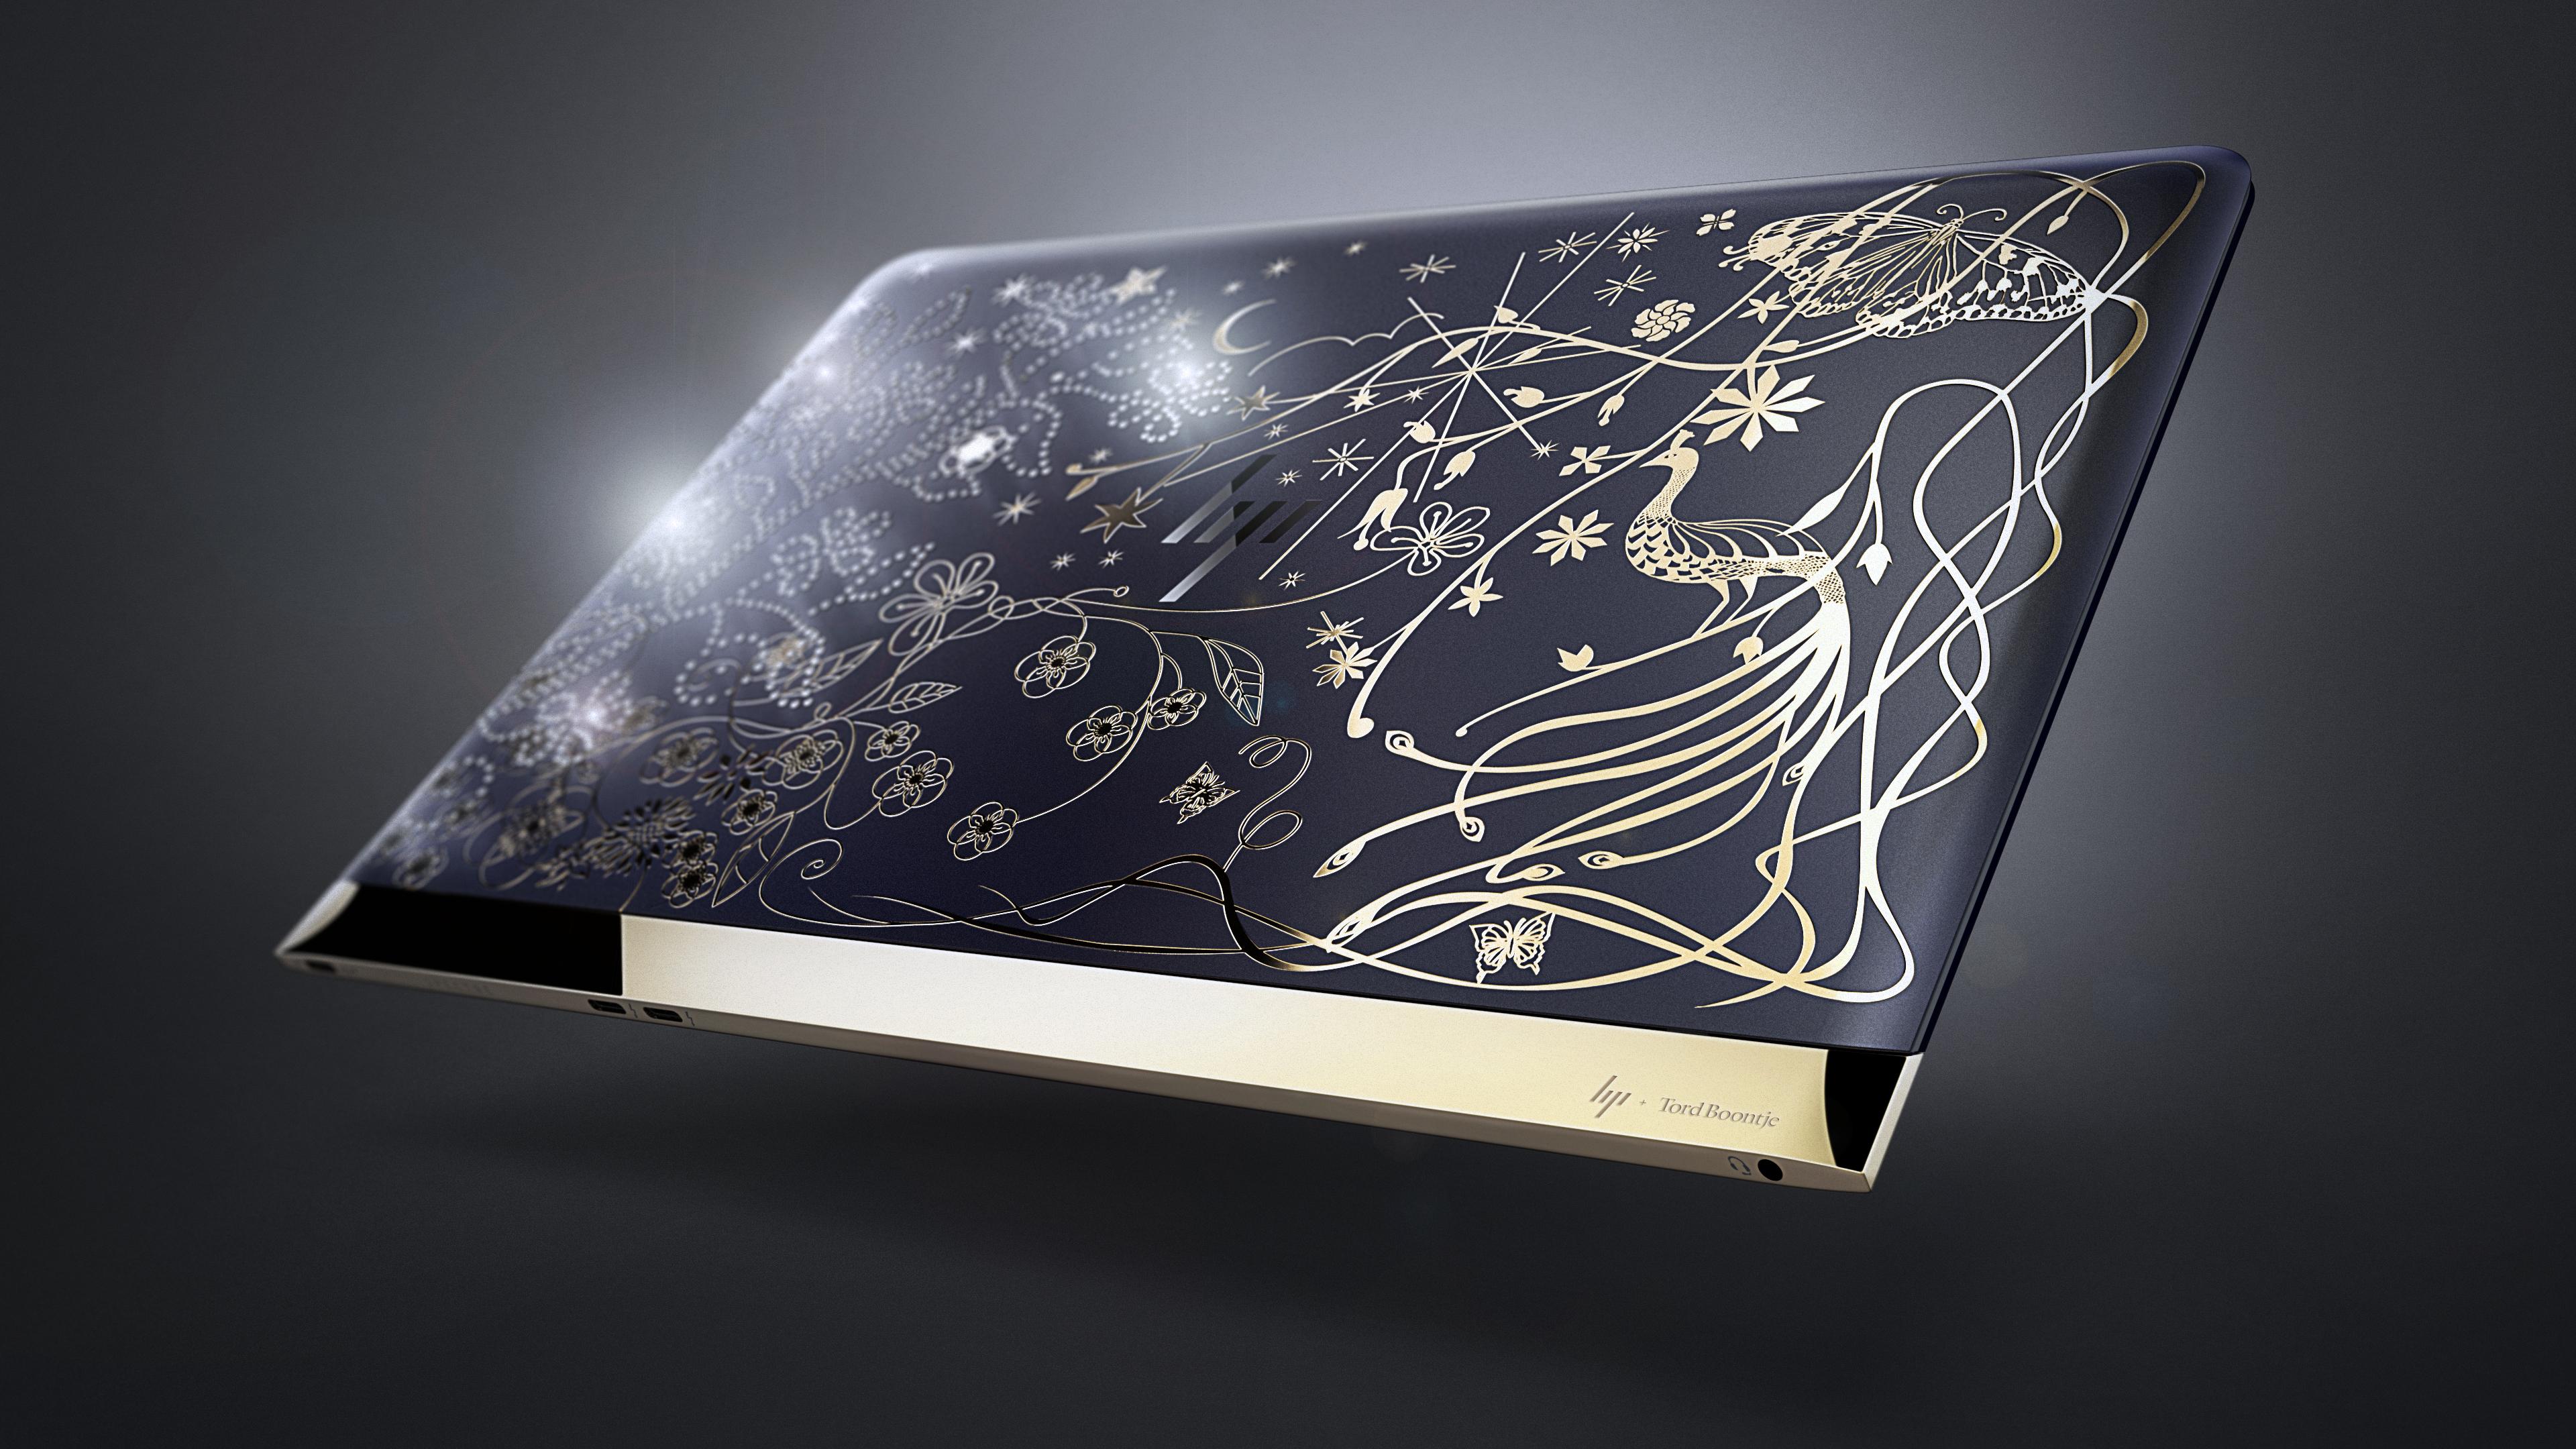 wallpaper laptop toshiba